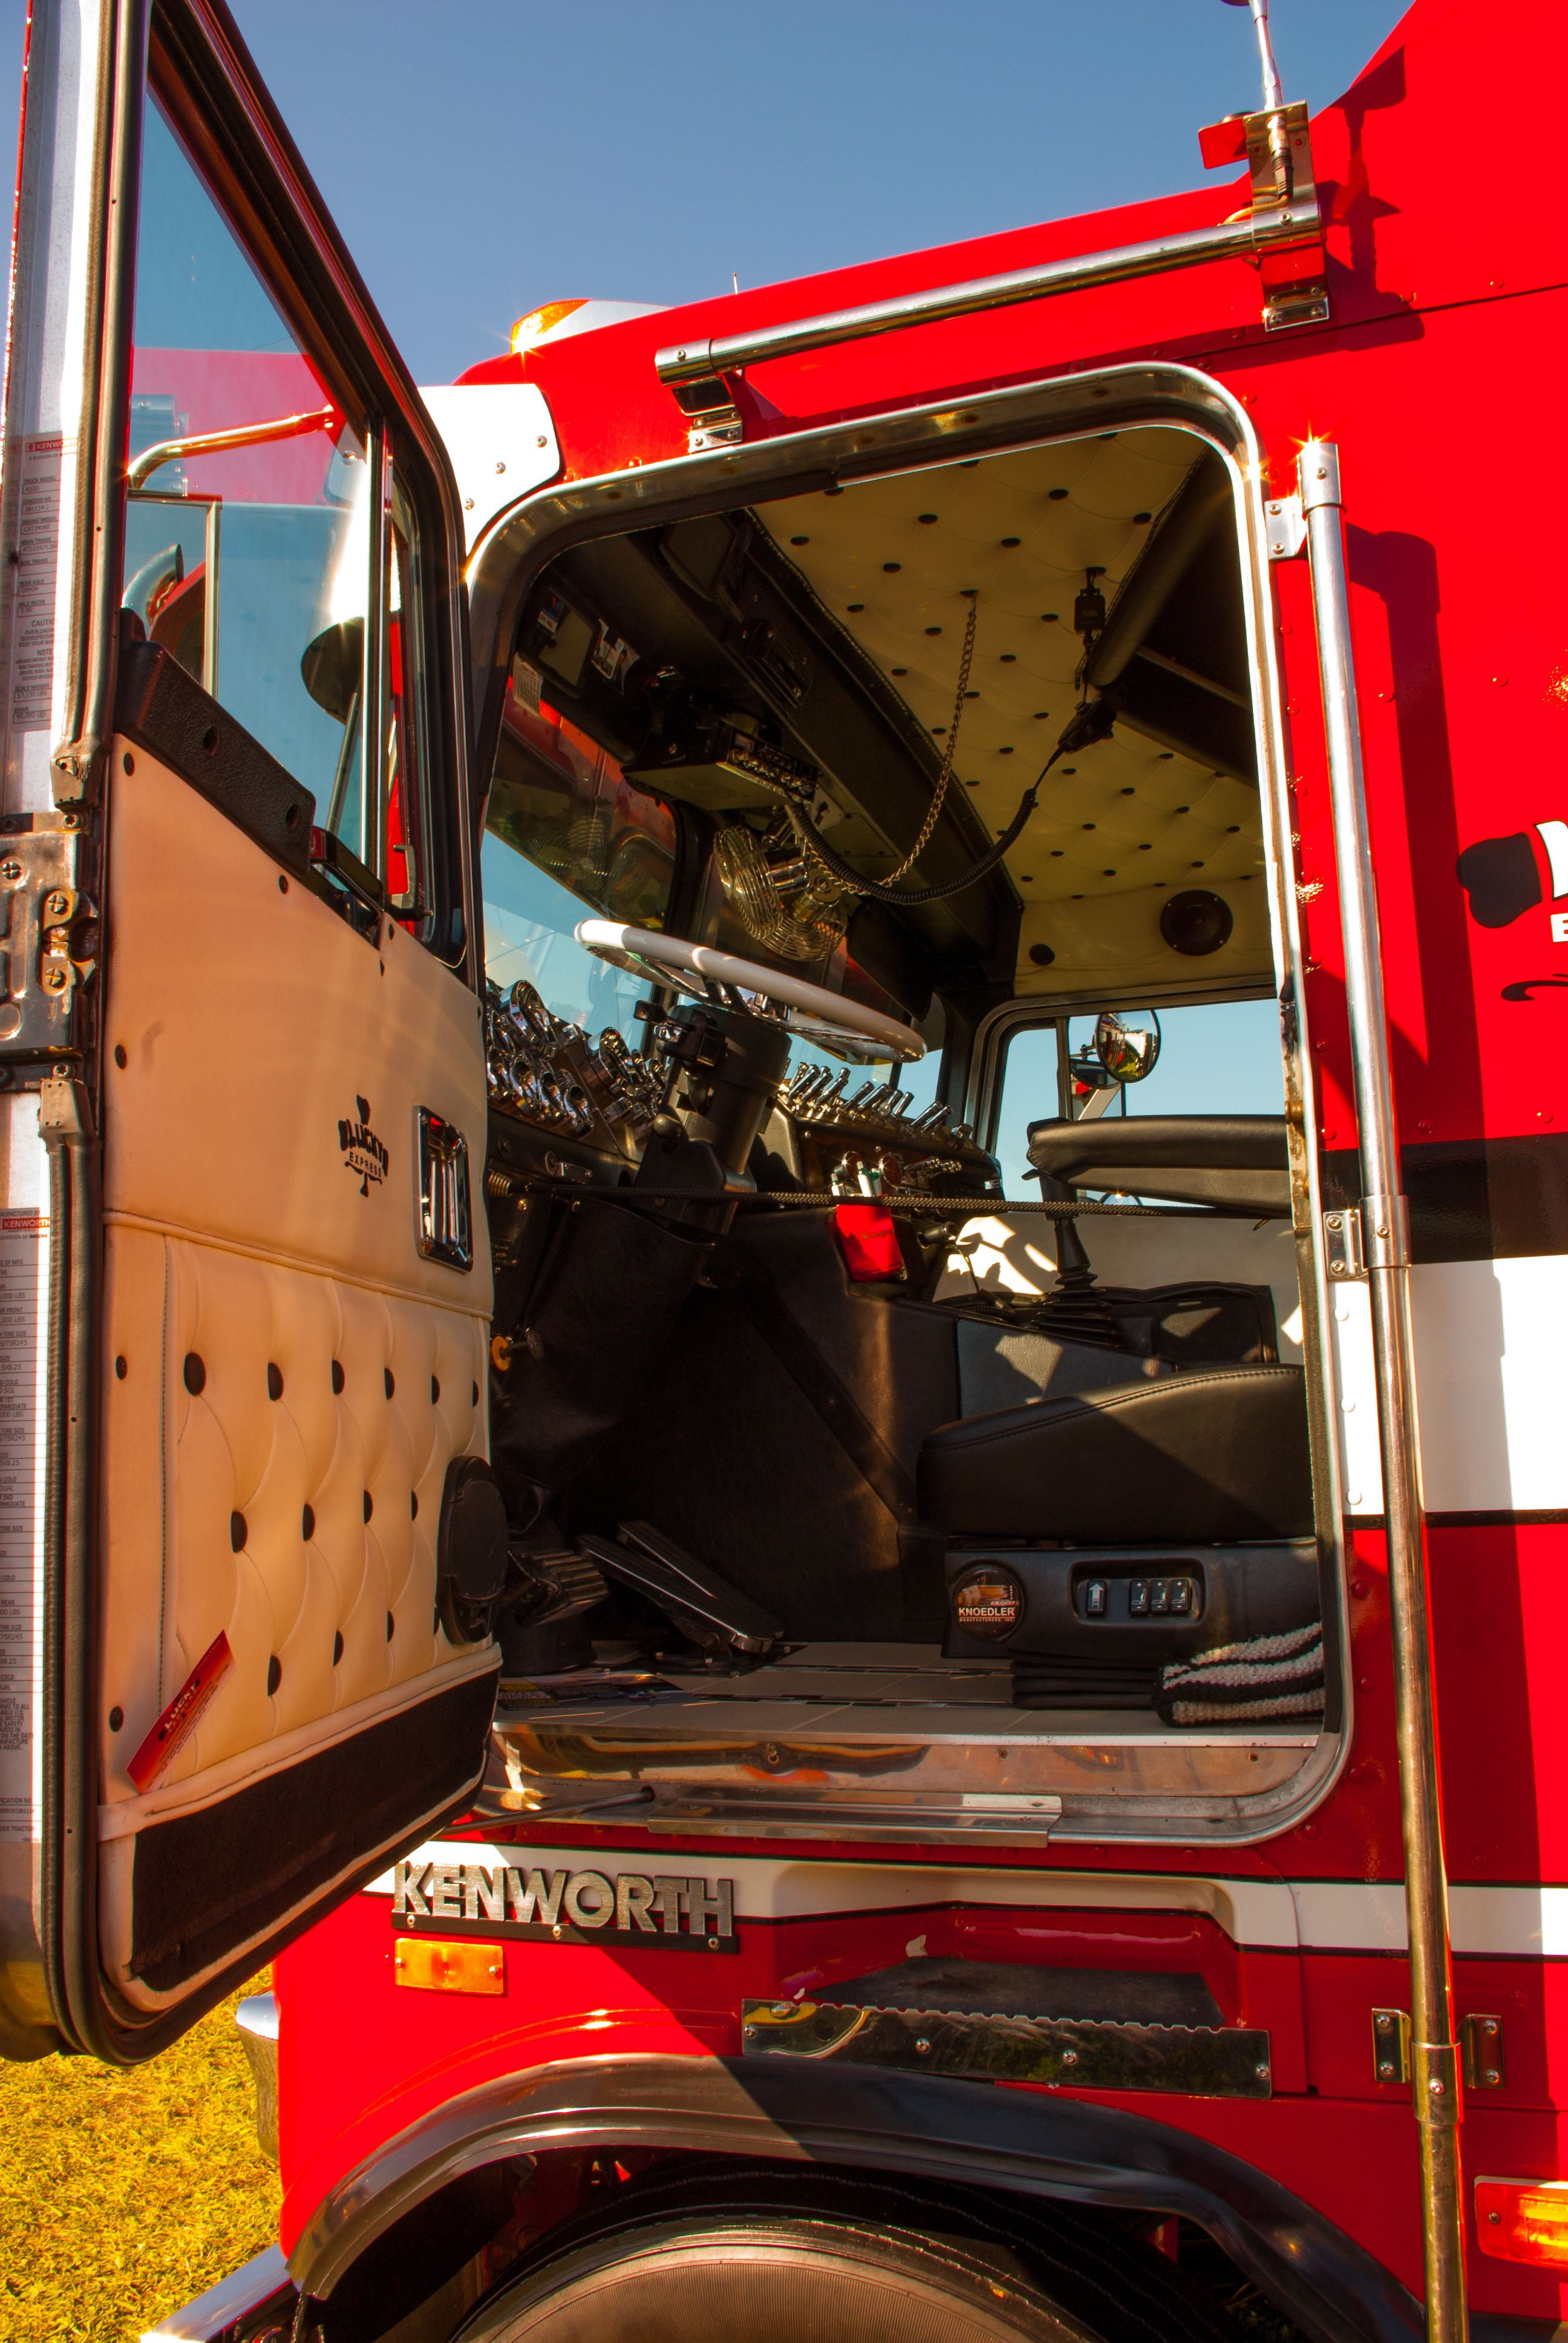 Kenworth Cabover Truck Interior Kenworth Trucks, Peterbilt, Cool Trucks, Big Trucks, Truck